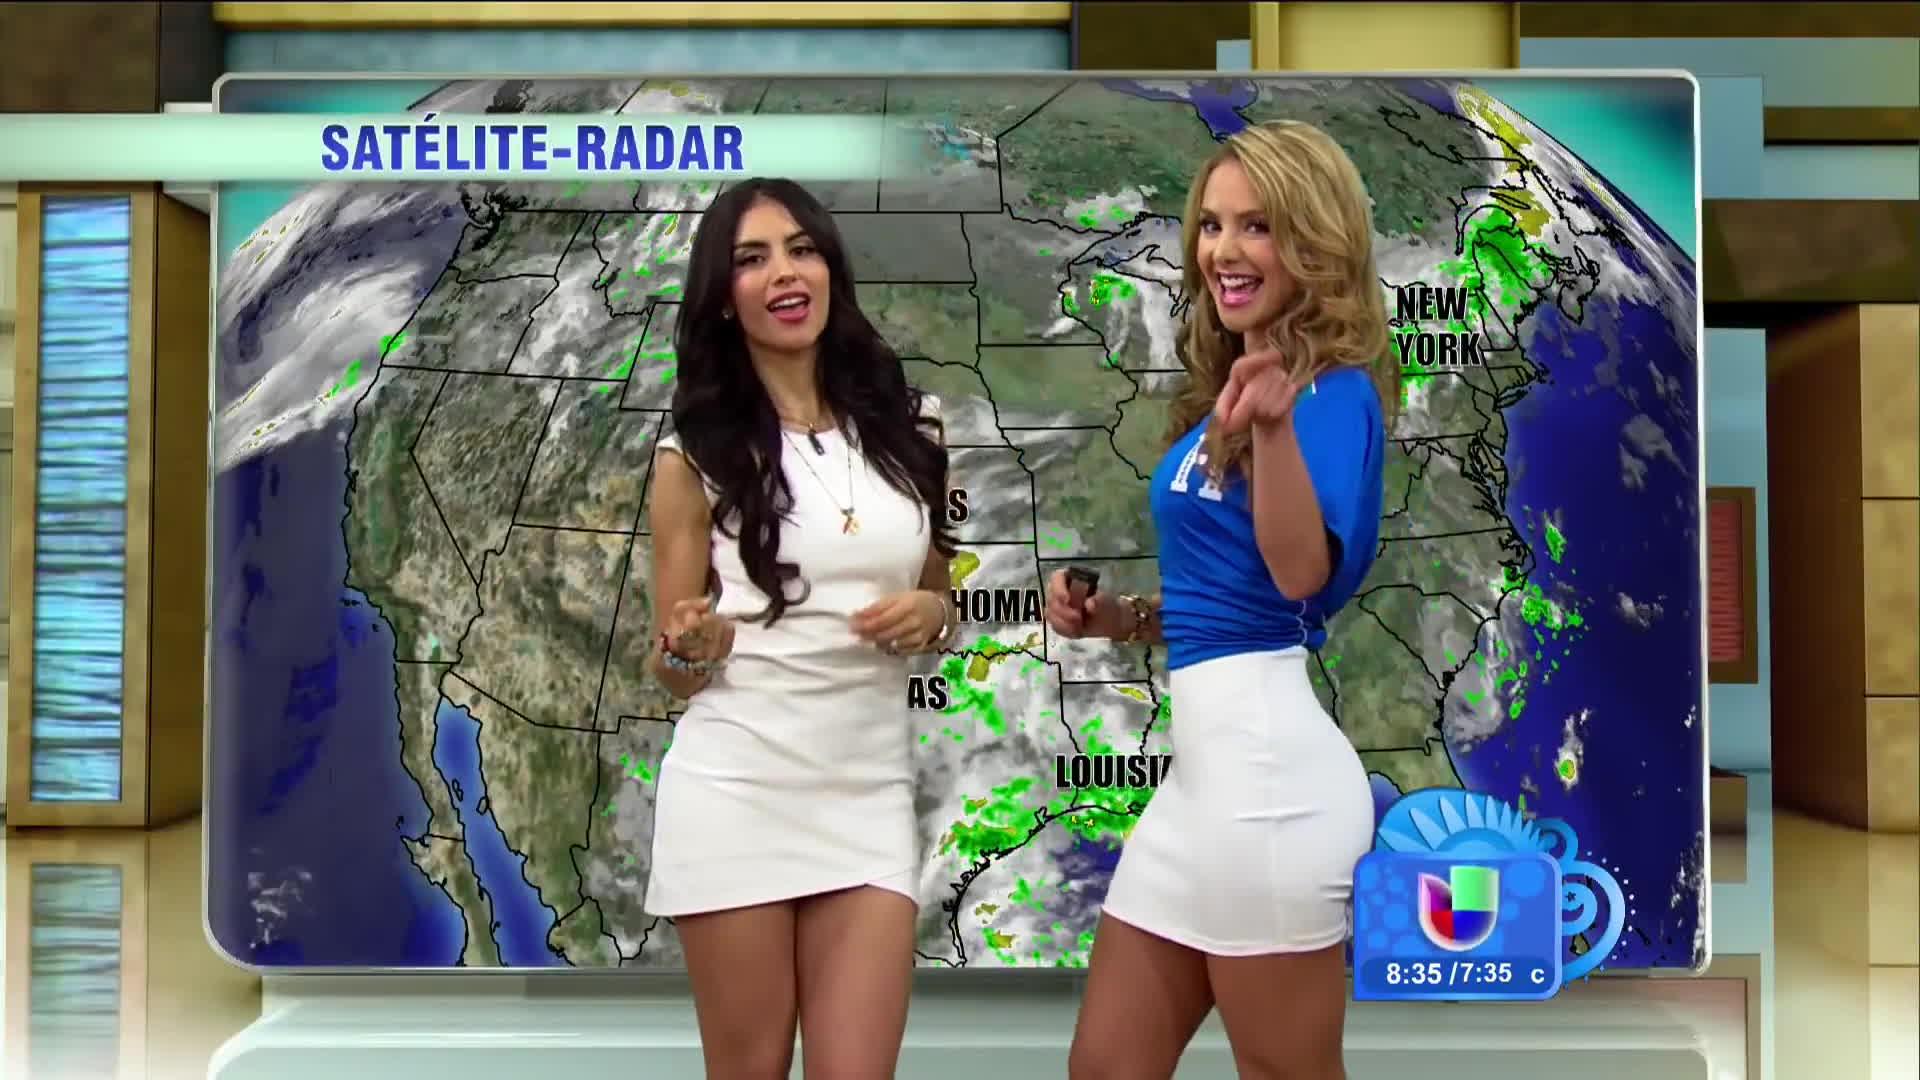 jessica cediel, newsbabes, ximena cordoba, Jessica Cediel and Ximena cordoba doing the sexy weather dance /r/NewsBabes GIFs